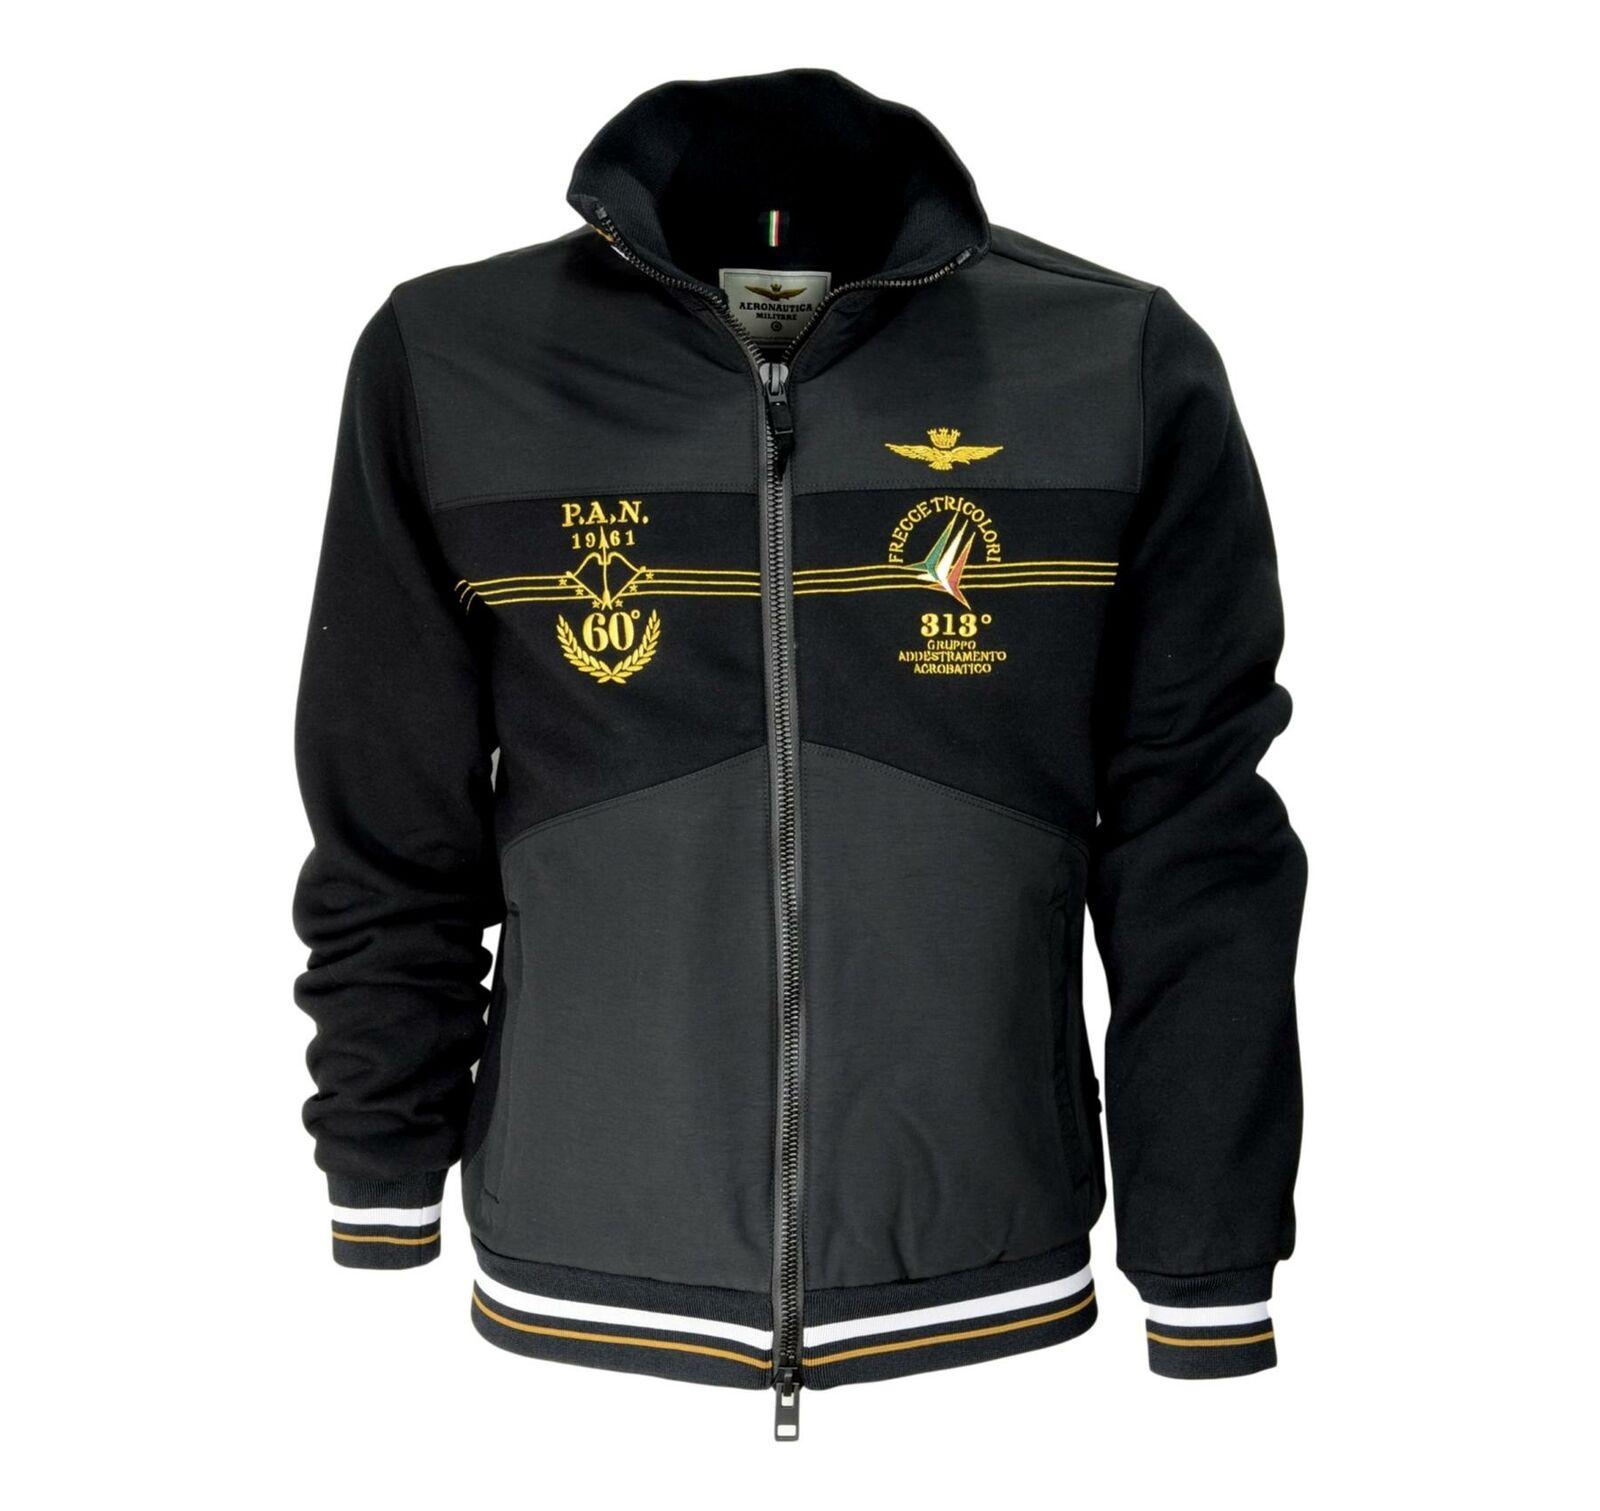 Aeronautica militare Sweatshirt Jacket 60 Anniversary Arrows Tricolour